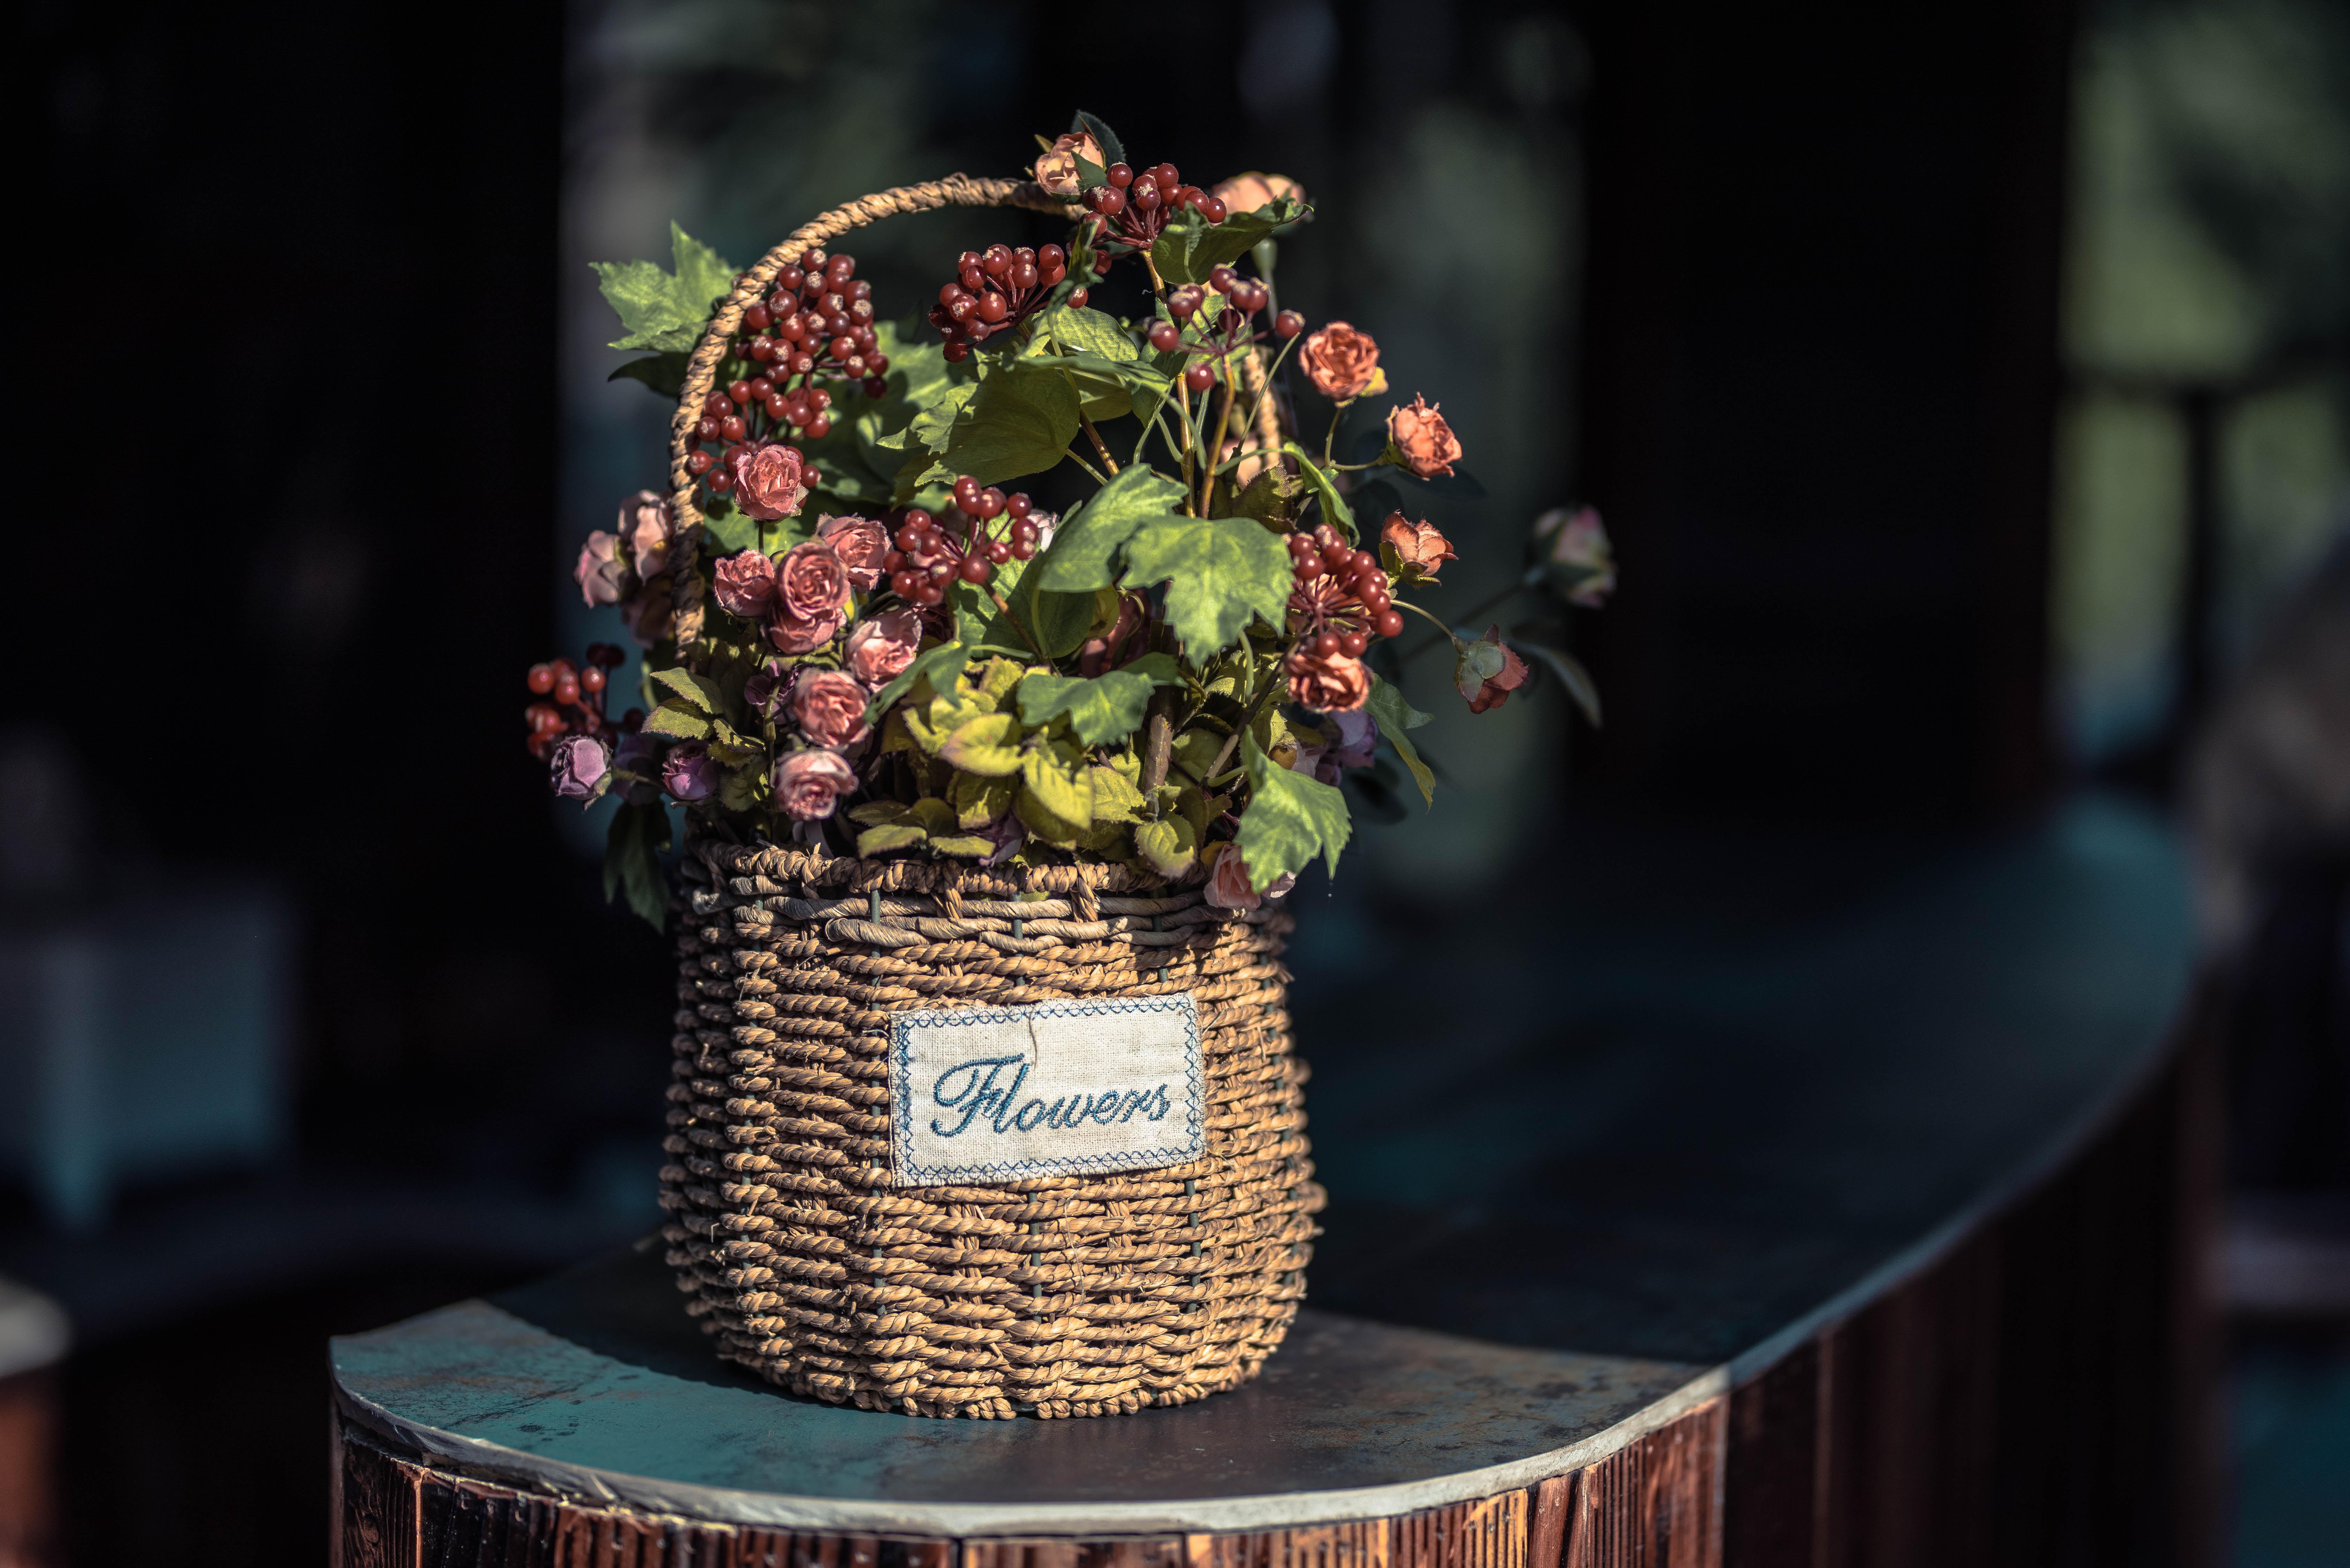 red flowers on brown wicker basket